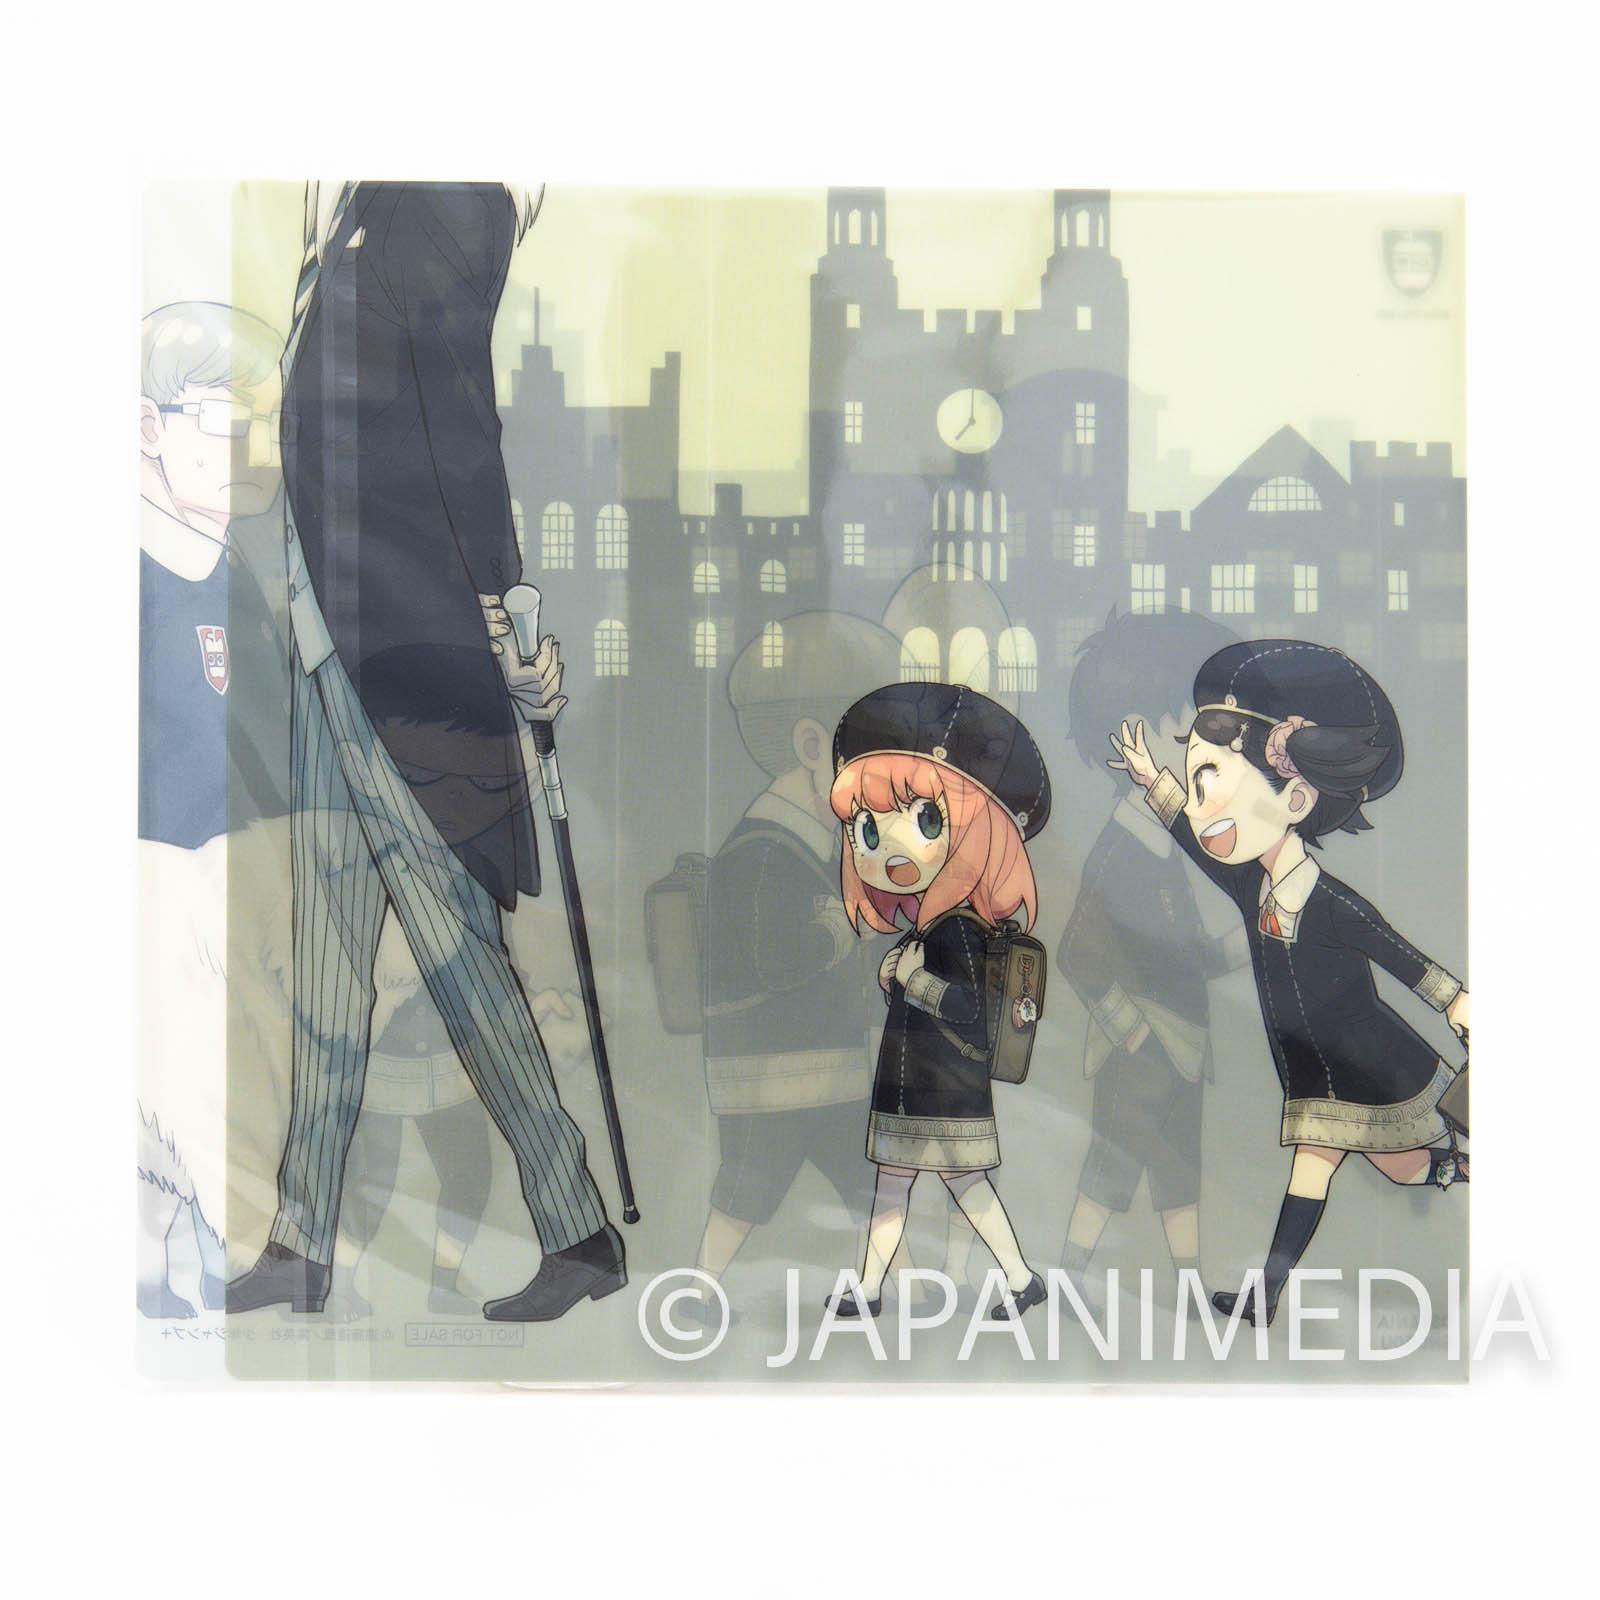 Spy x Family Eden college member Original Clear Book cover JAPAN MANGA